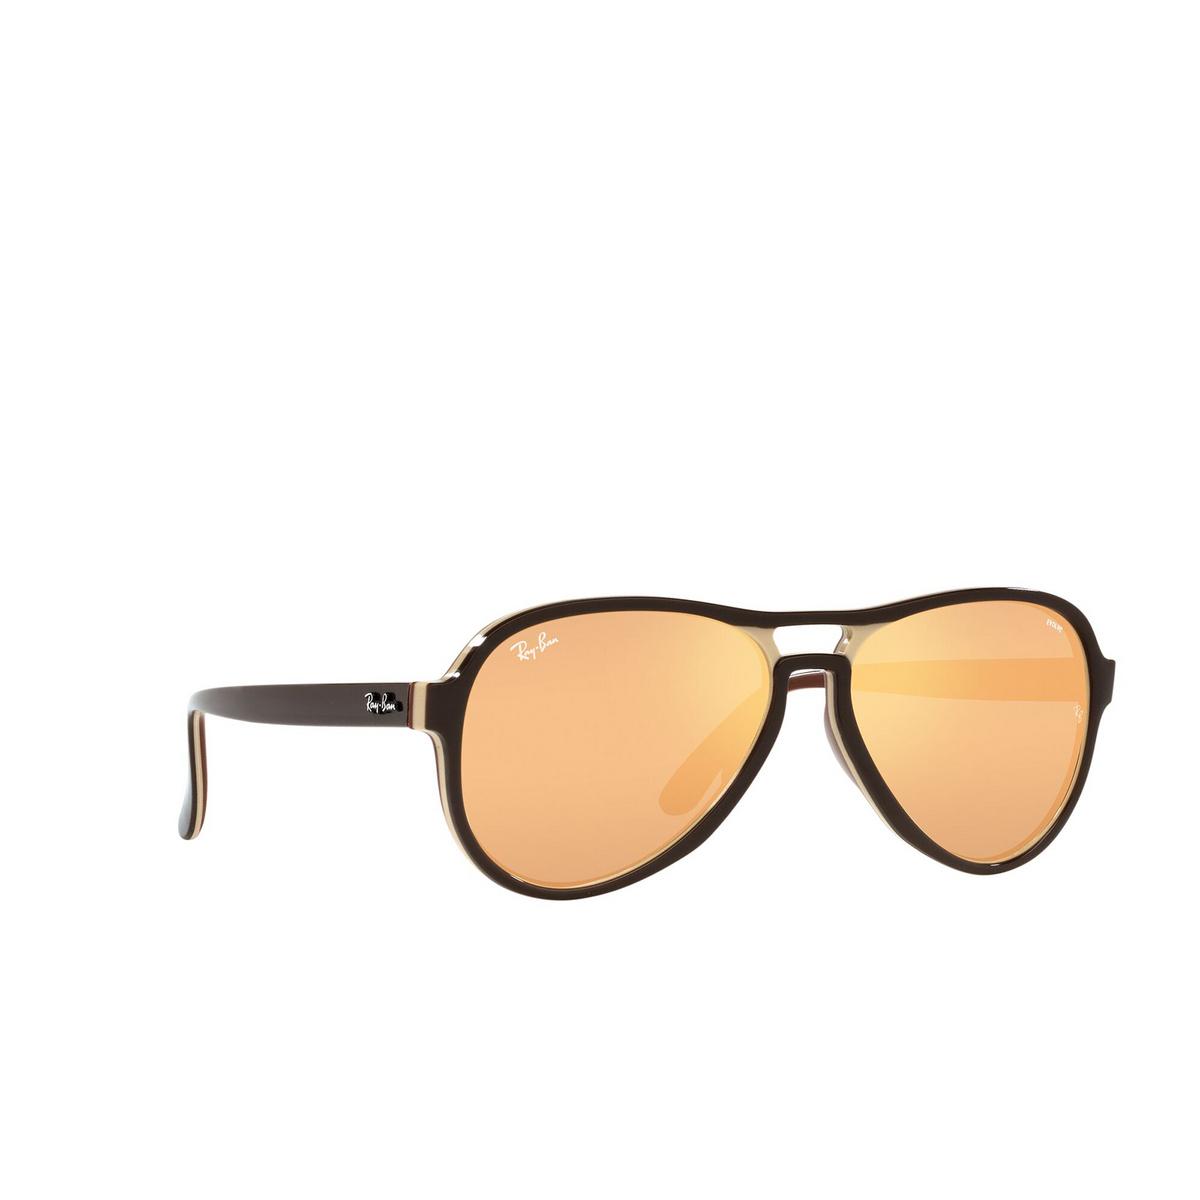 Ray-Ban® Aviator Sunglasses: Vagabond RB4355 color Dark Brown Light Brown 6547B4 - three-quarters view.